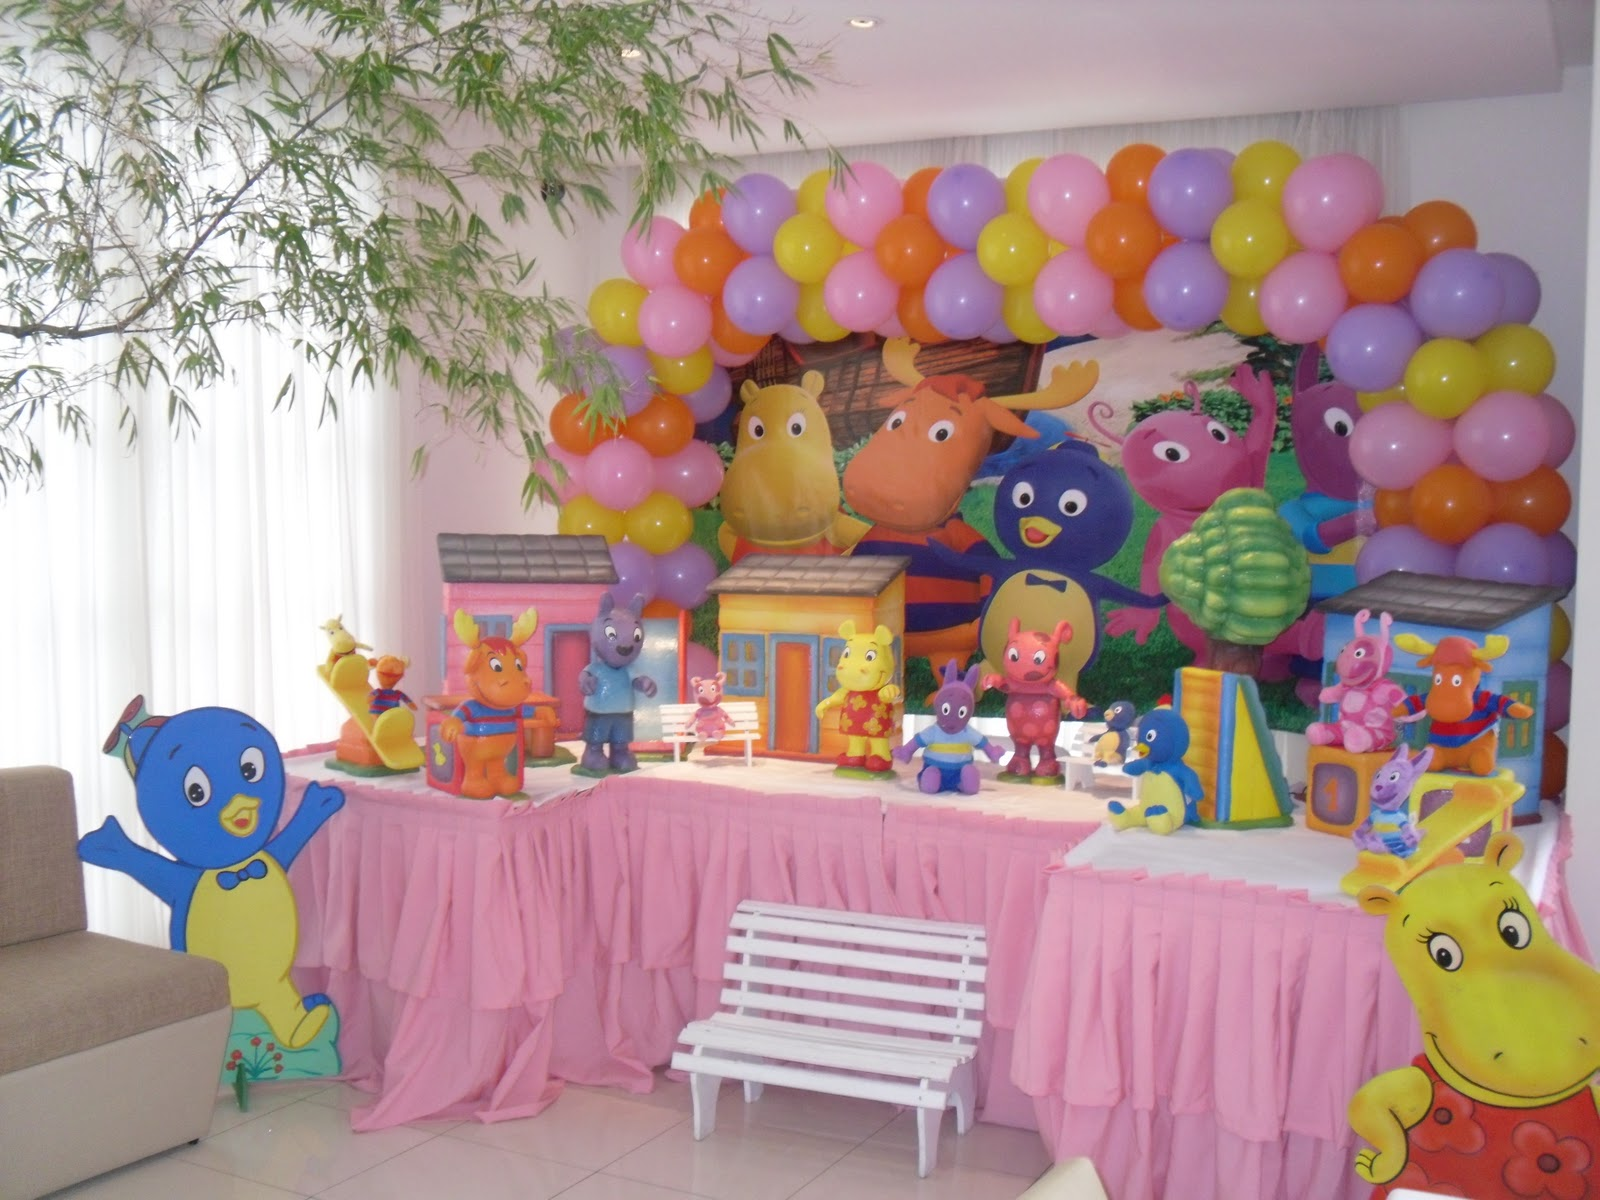 Festa Backyardigans – Rosa – 09/10~ Decoracao Festa Backyardigans